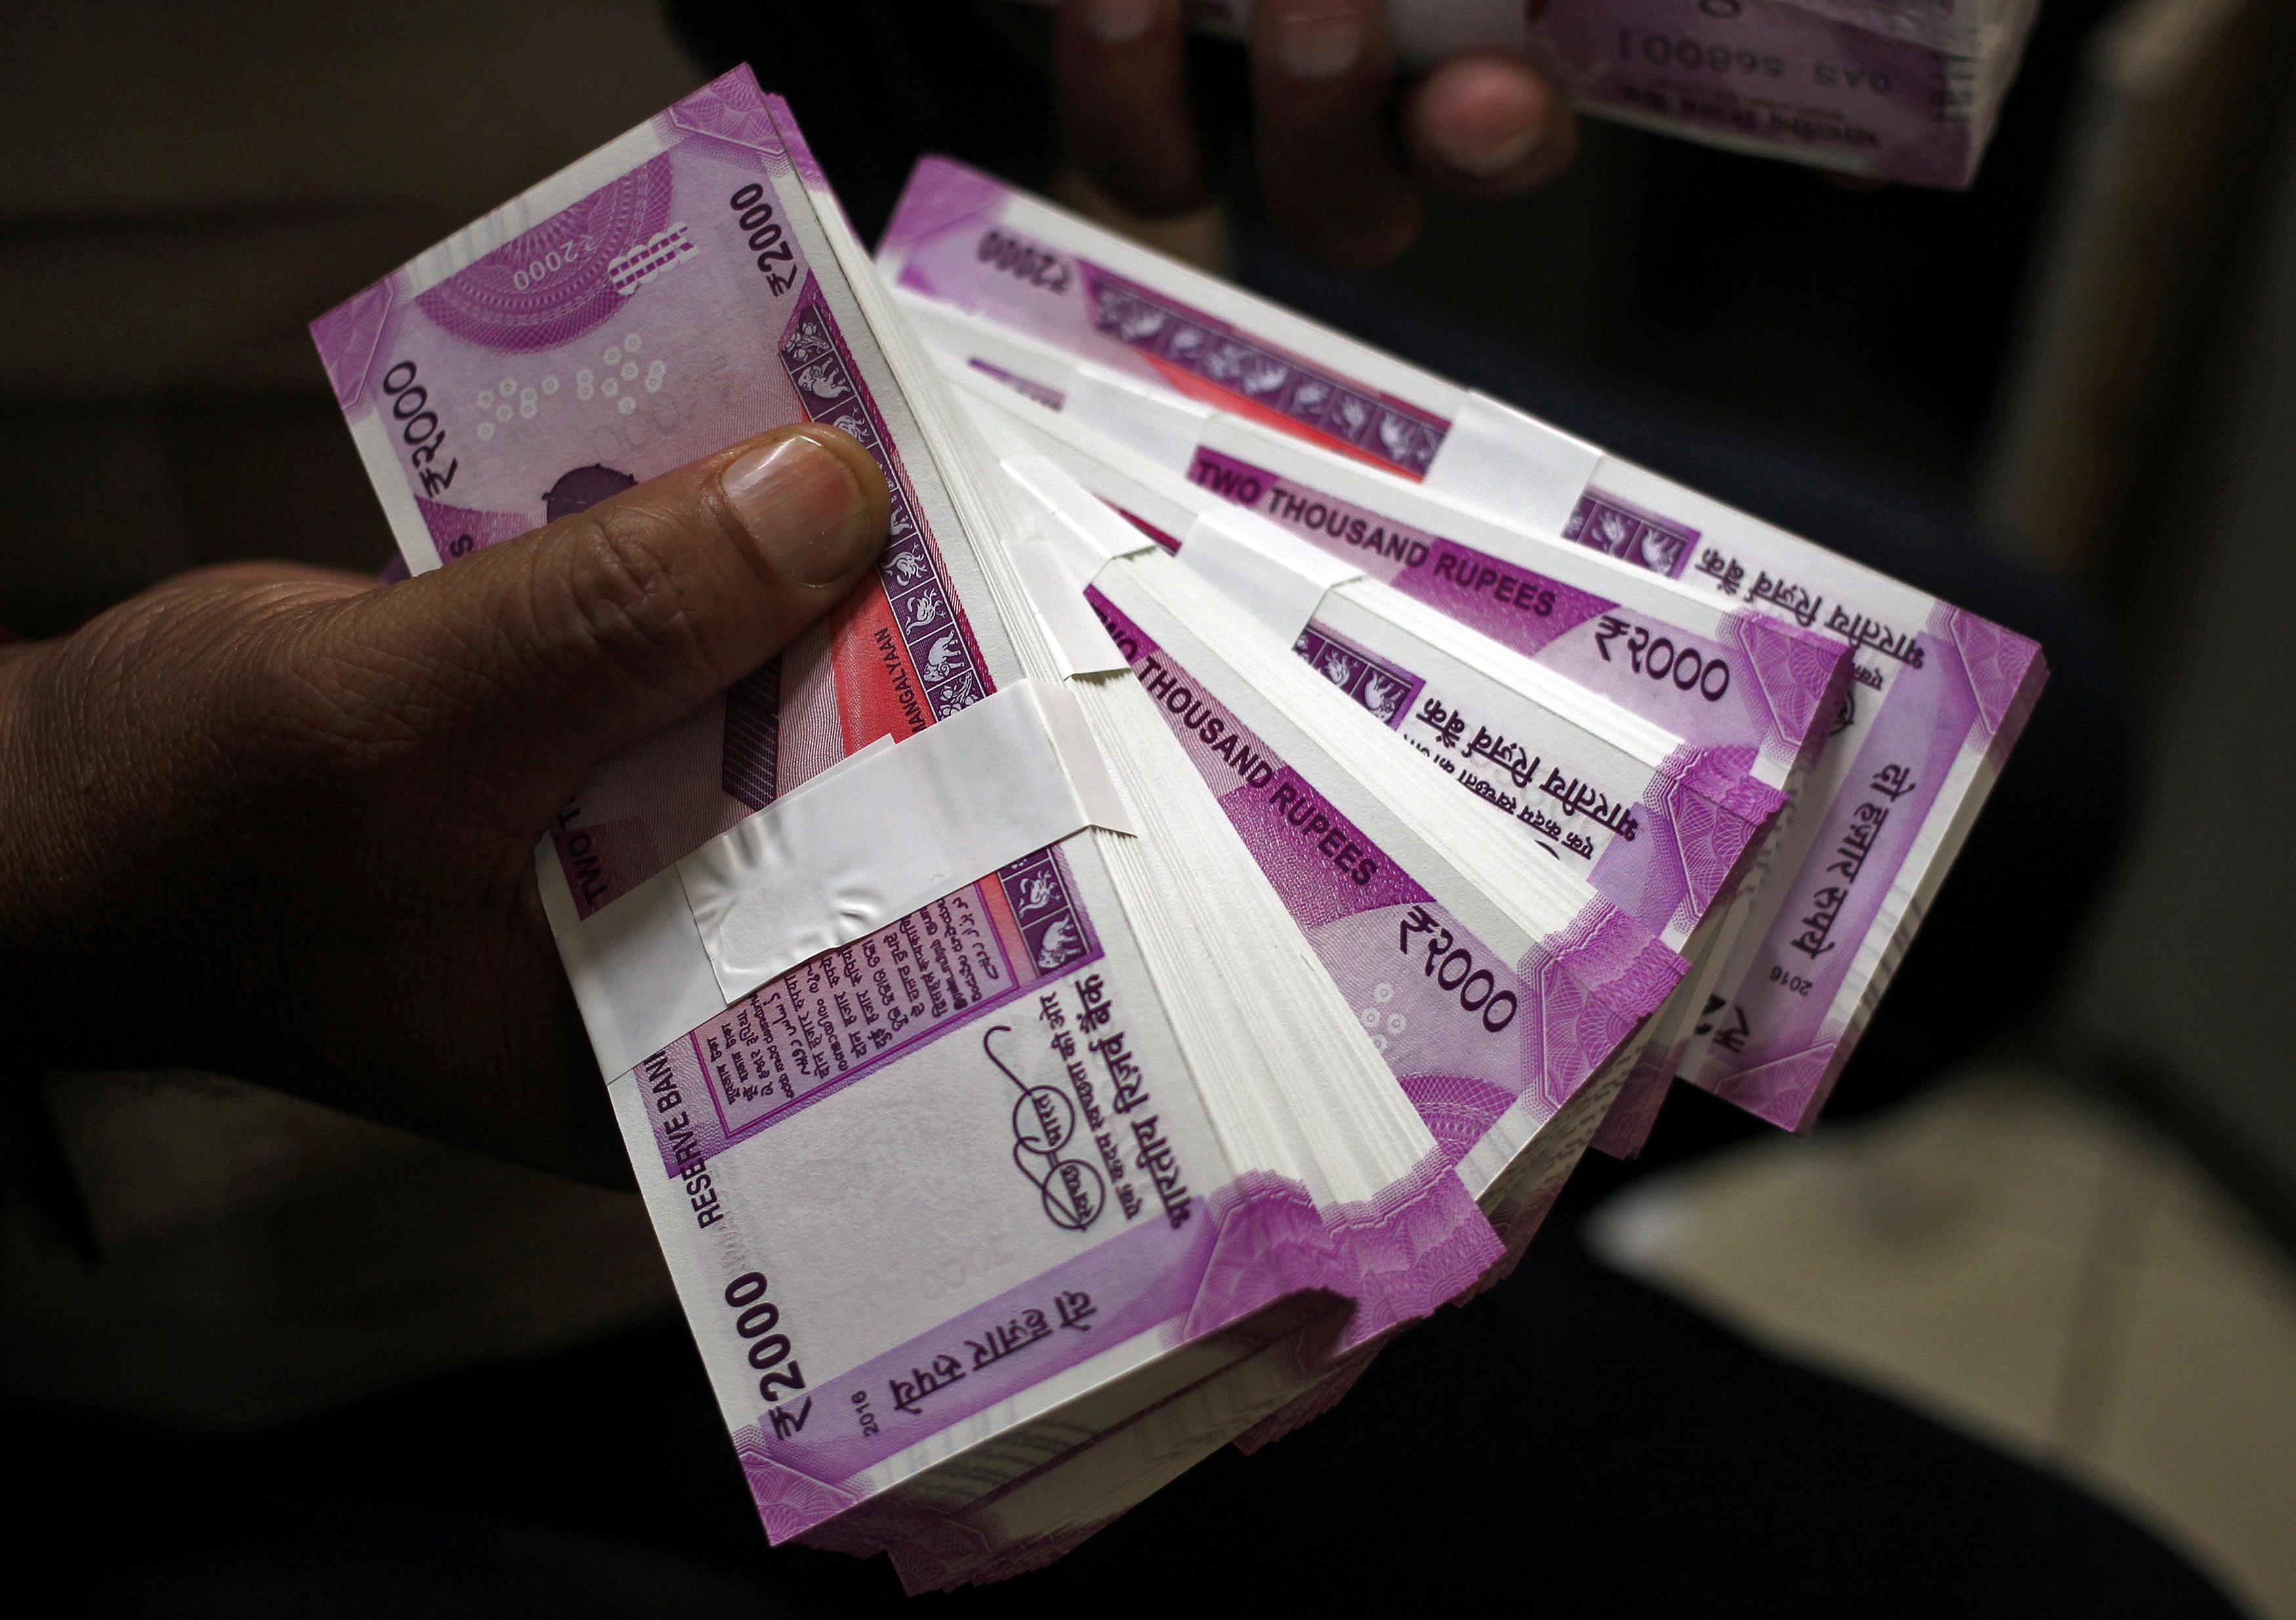 A cashier displays the new 2000 Indian rupee banknotes inside a bank in Jammu, November 15, 2016. REUTERS/Mukesh Gupta